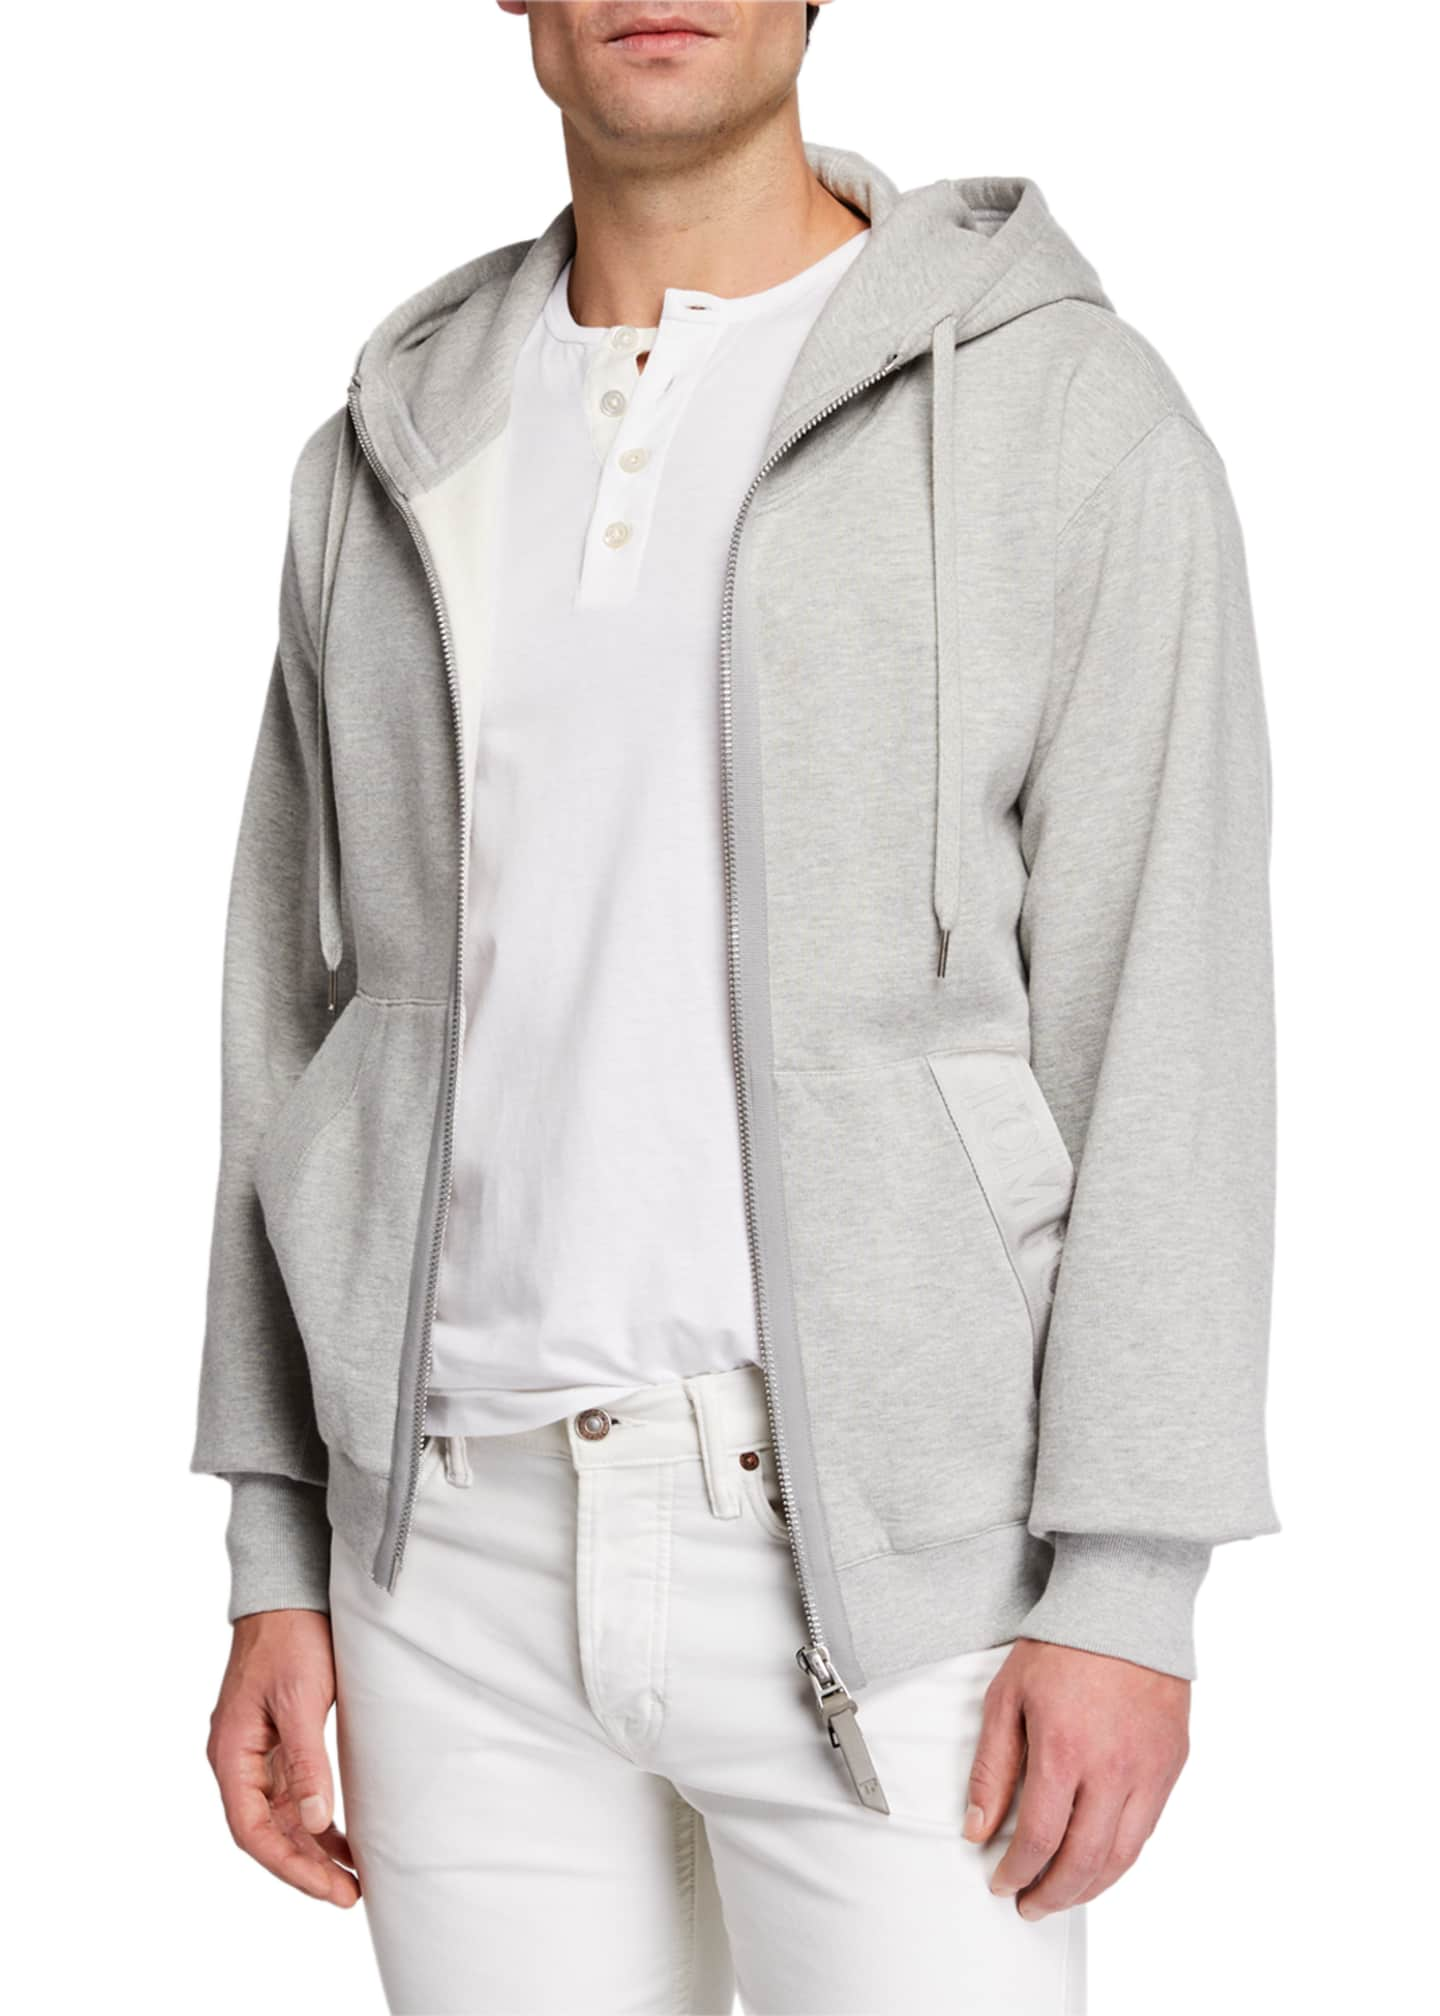 TOM FORD Men's Garment Dyed Hoodie Sweatshirt, Gray